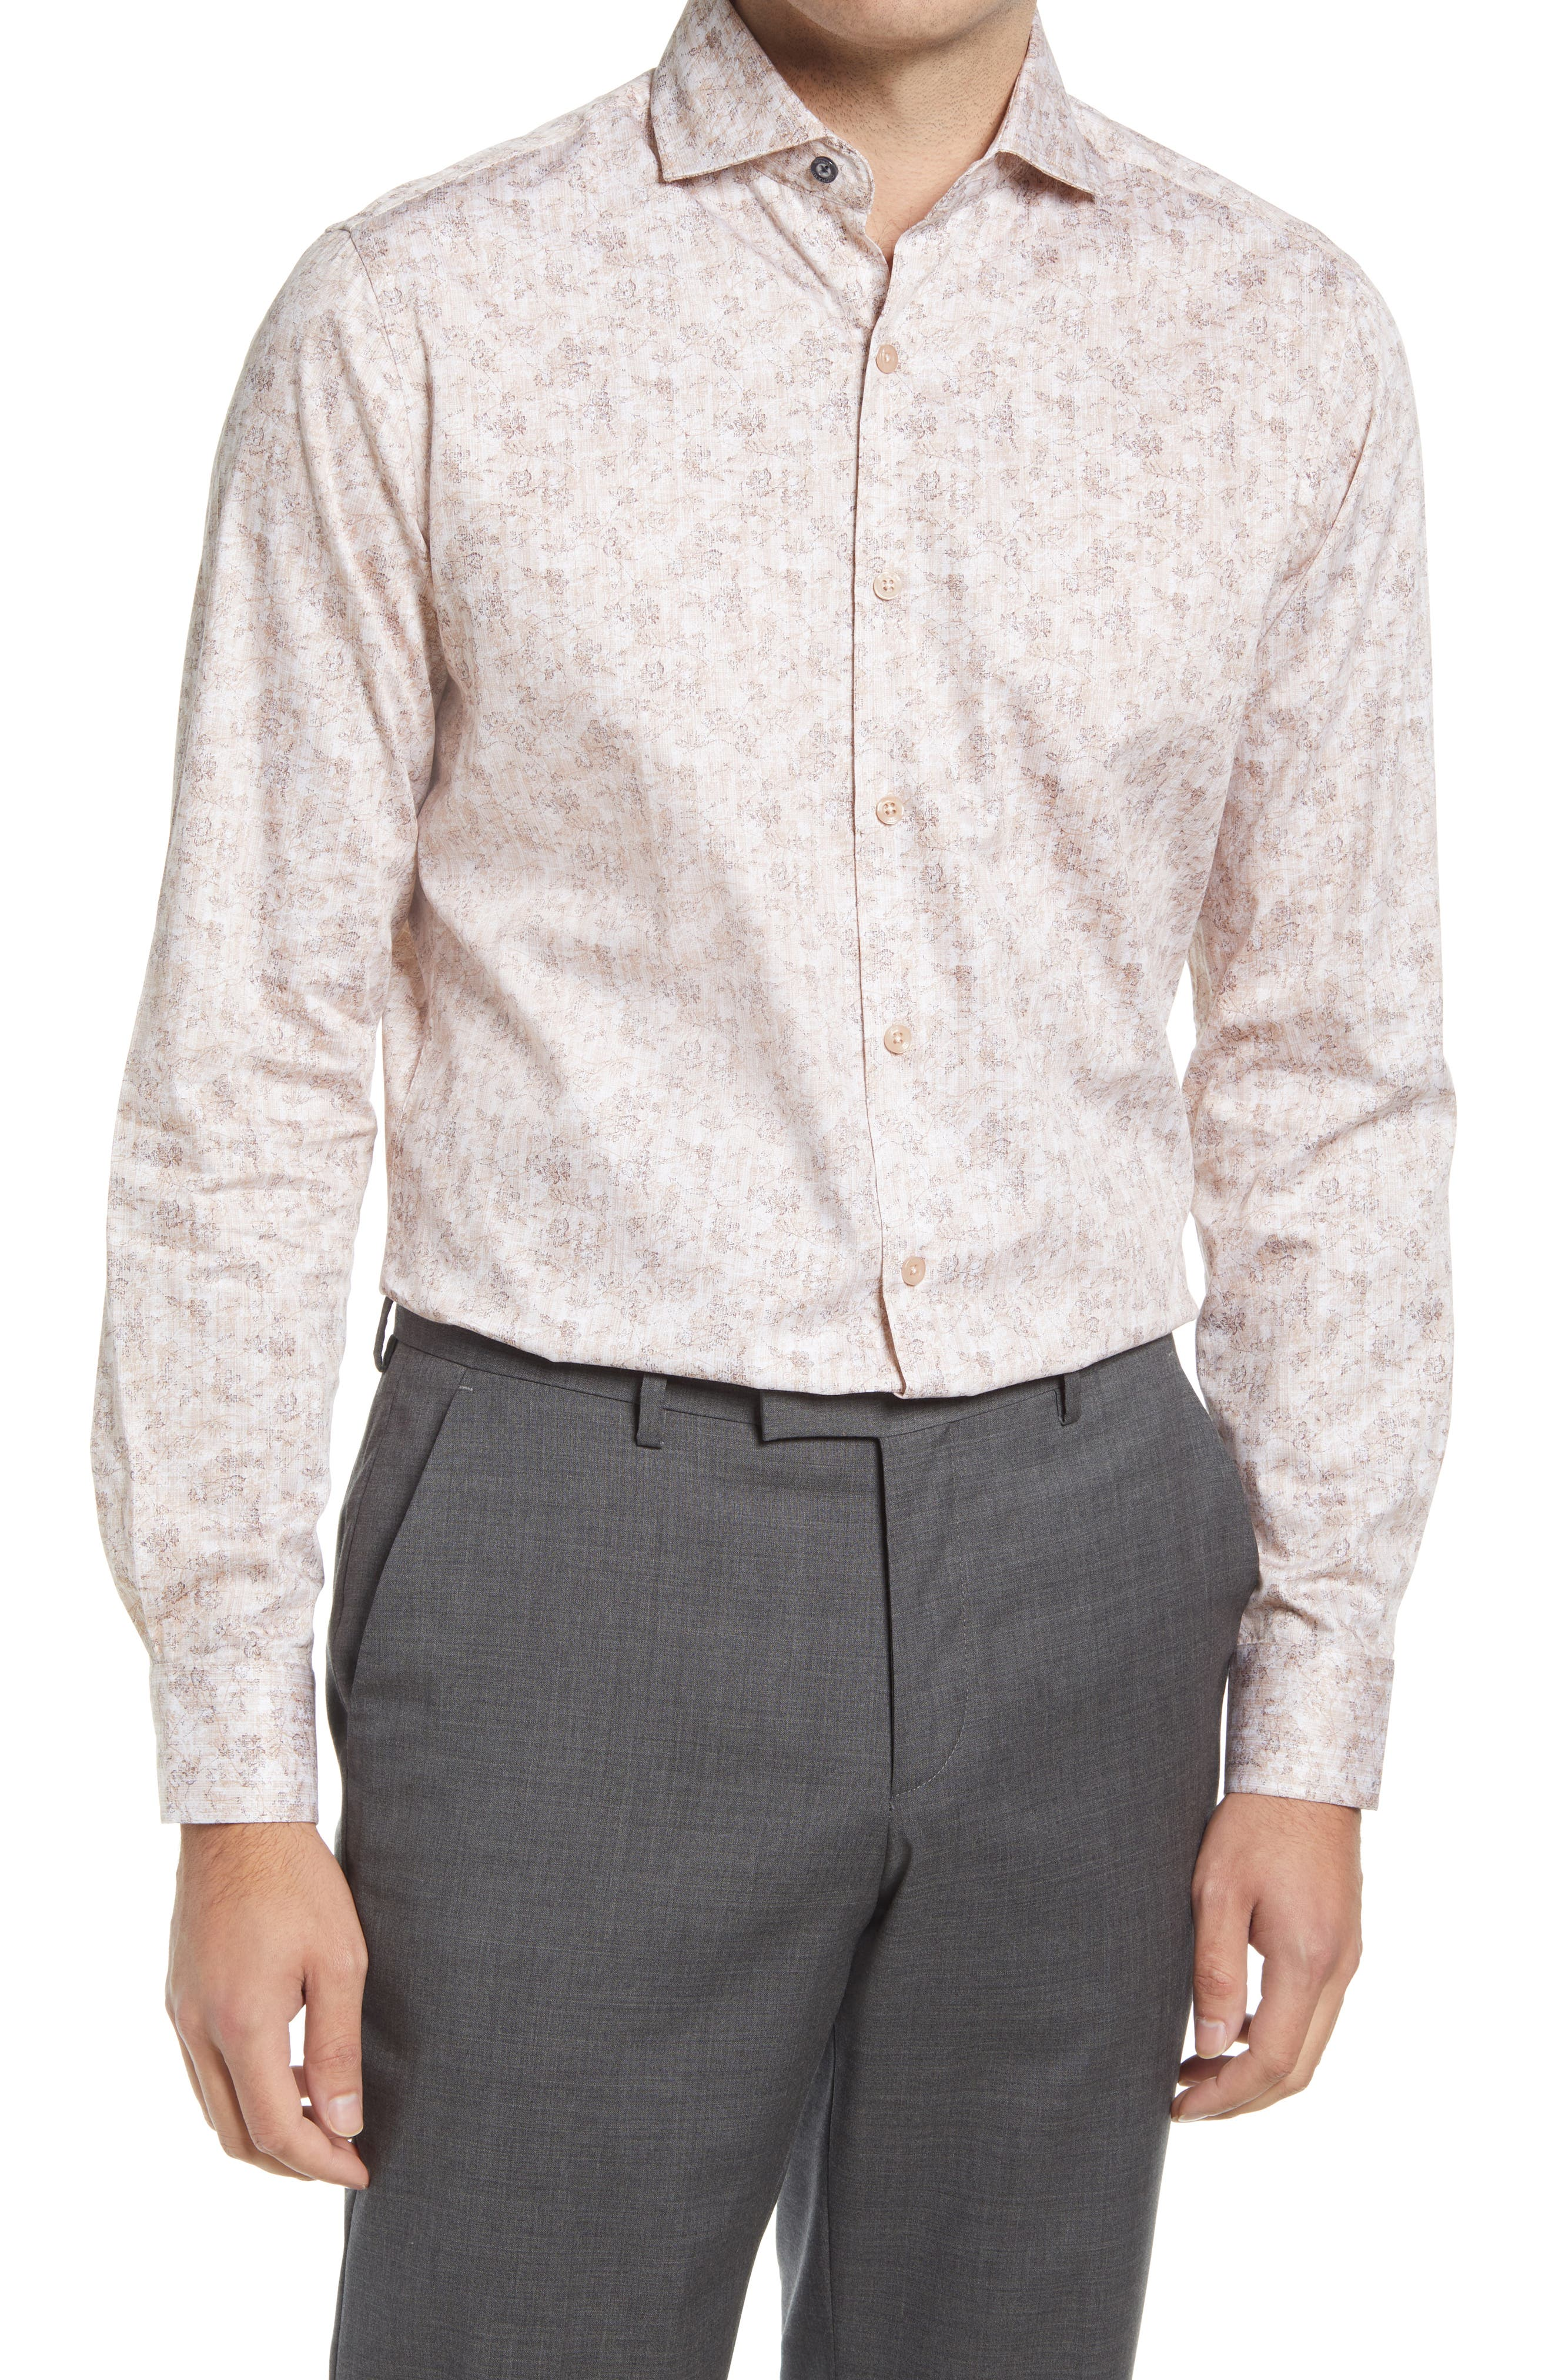 Men's Tailored Fit Floral Dress Shirt